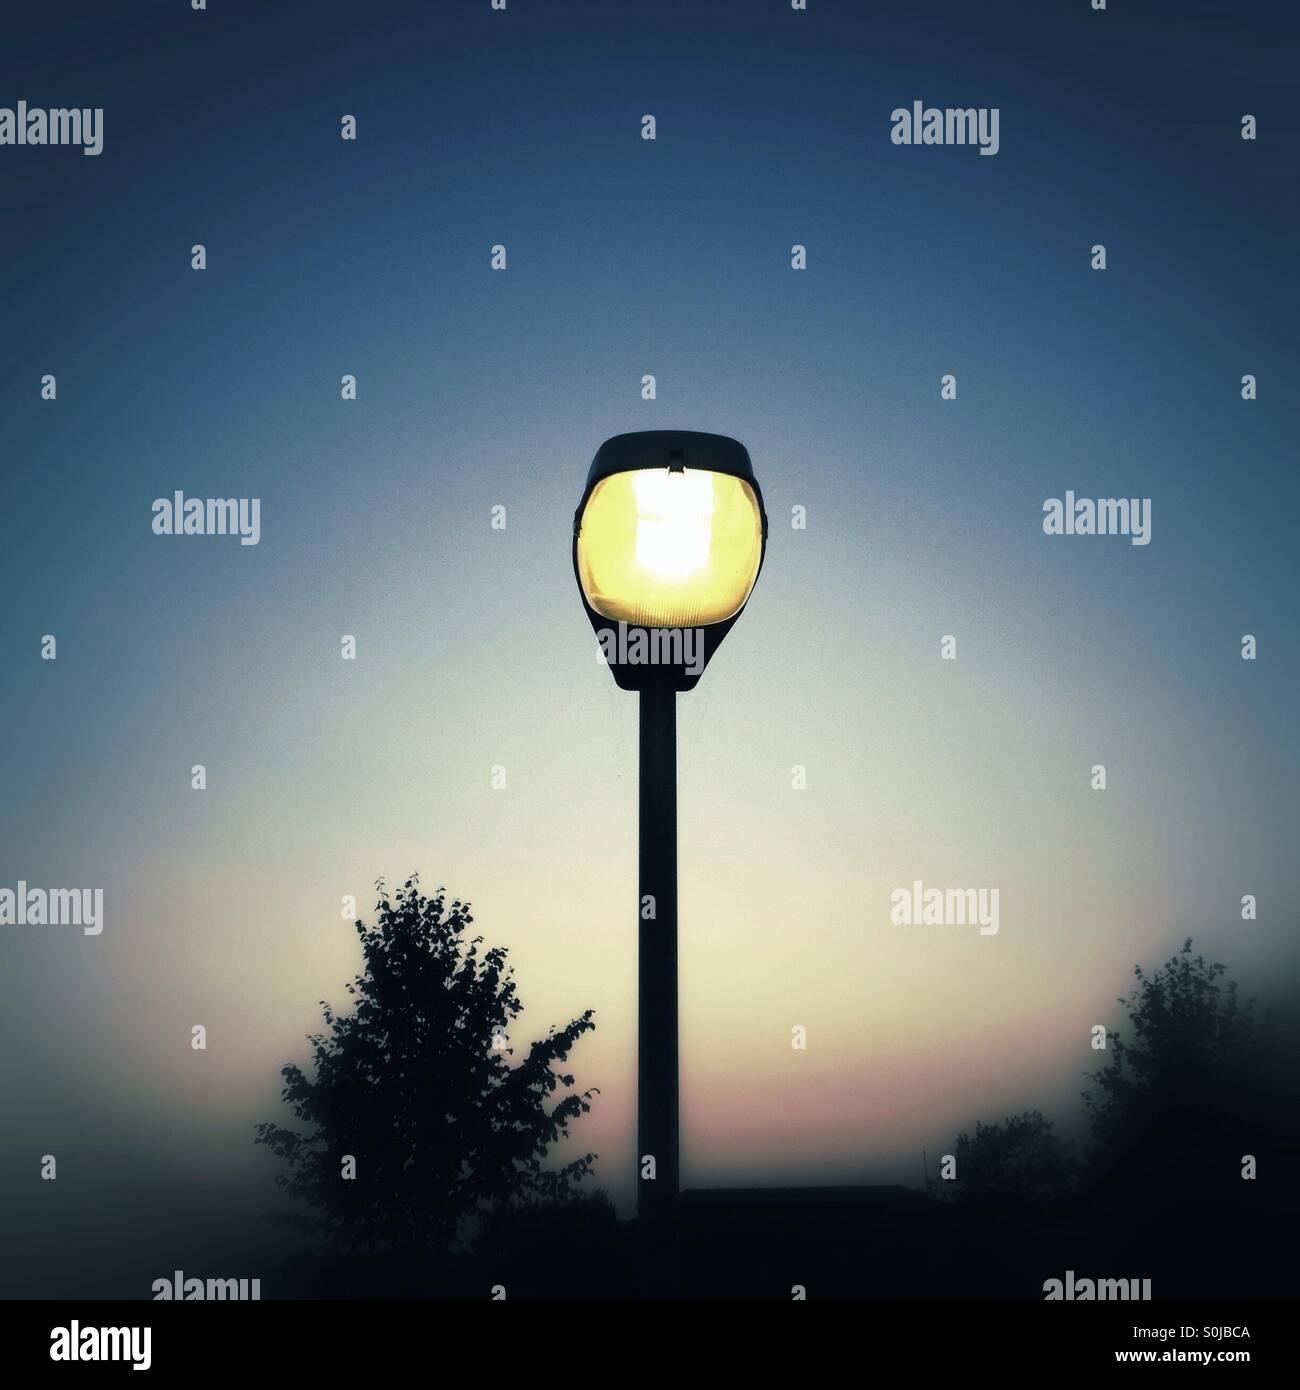 Streetlamp - Stock Image